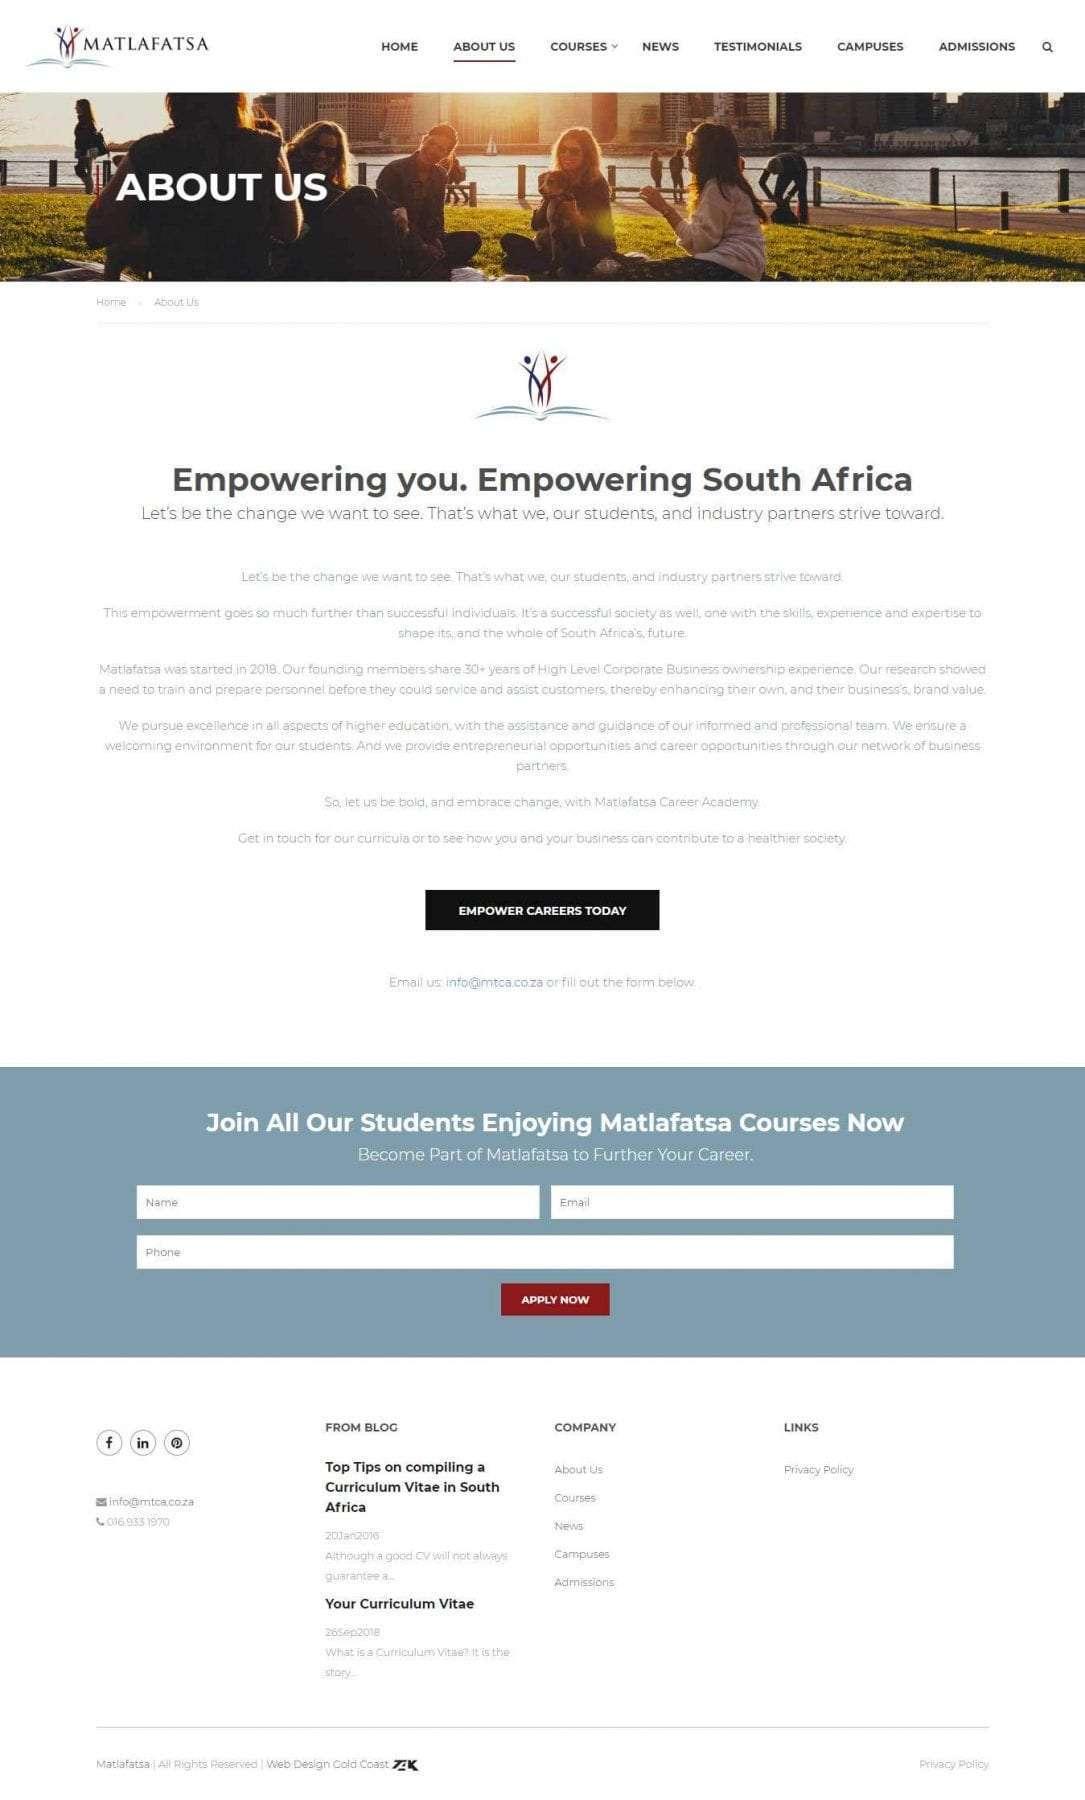 Matlafatsa website - About Us